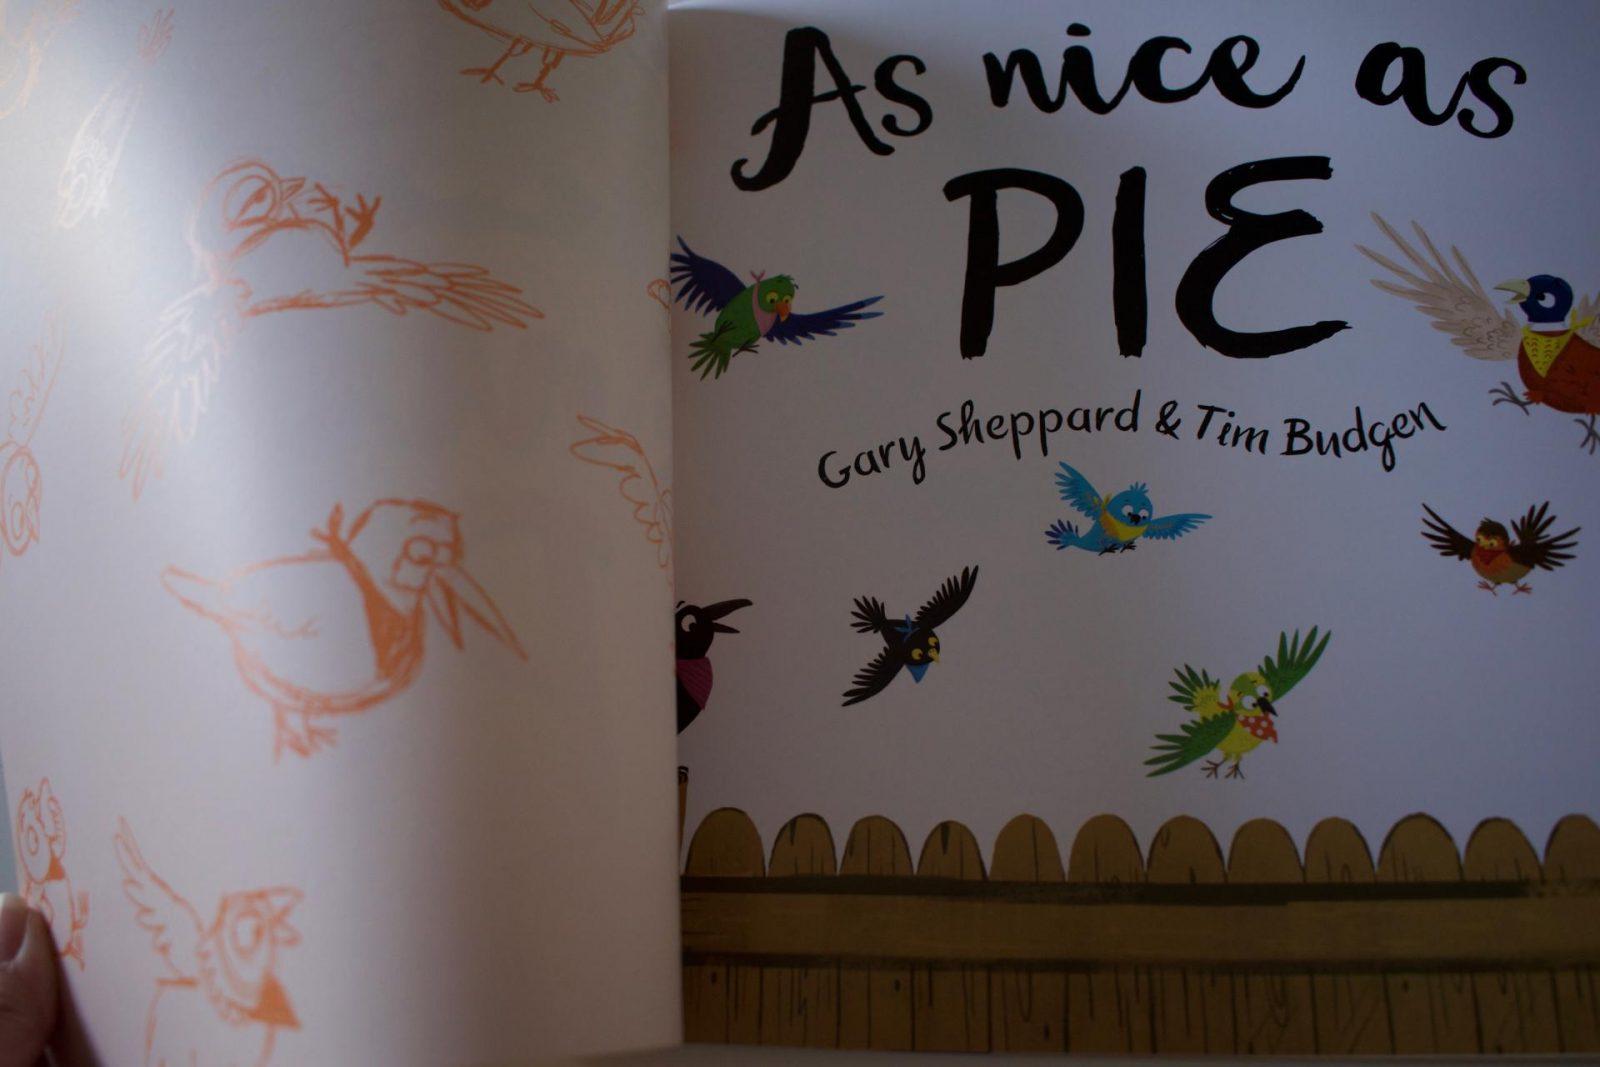 As Nice A Pie, Gary Sheppard